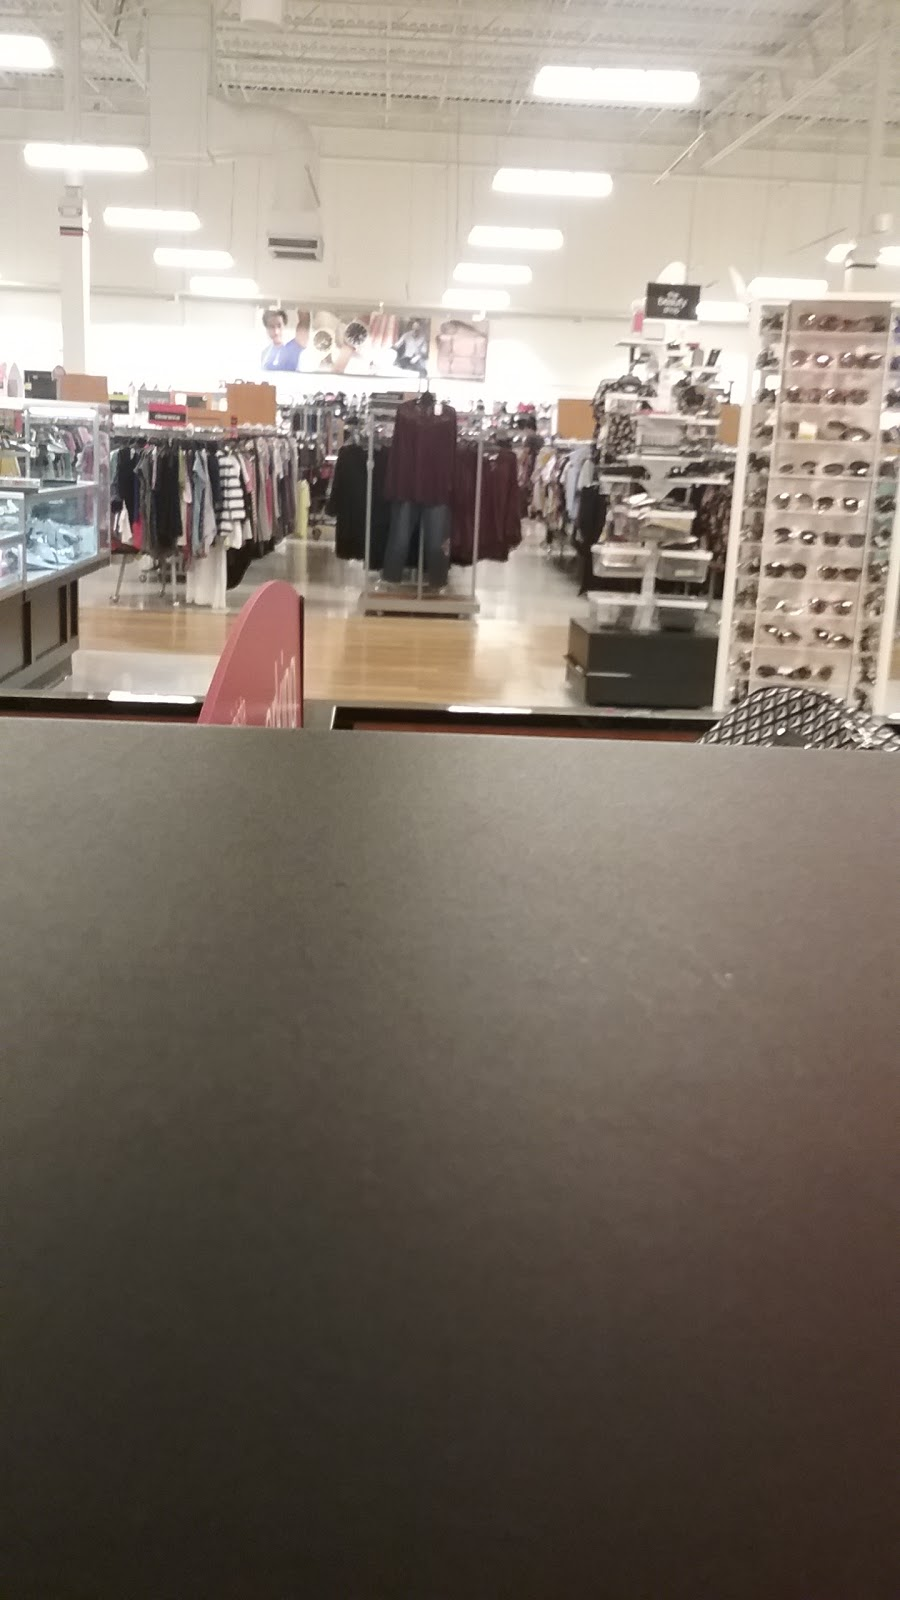 T.J. Maxx - clothing store  | Photo 10 of 10 | Address: 78-825 CA-111, La Quinta, CA 92253, USA | Phone: (760) 564-2885